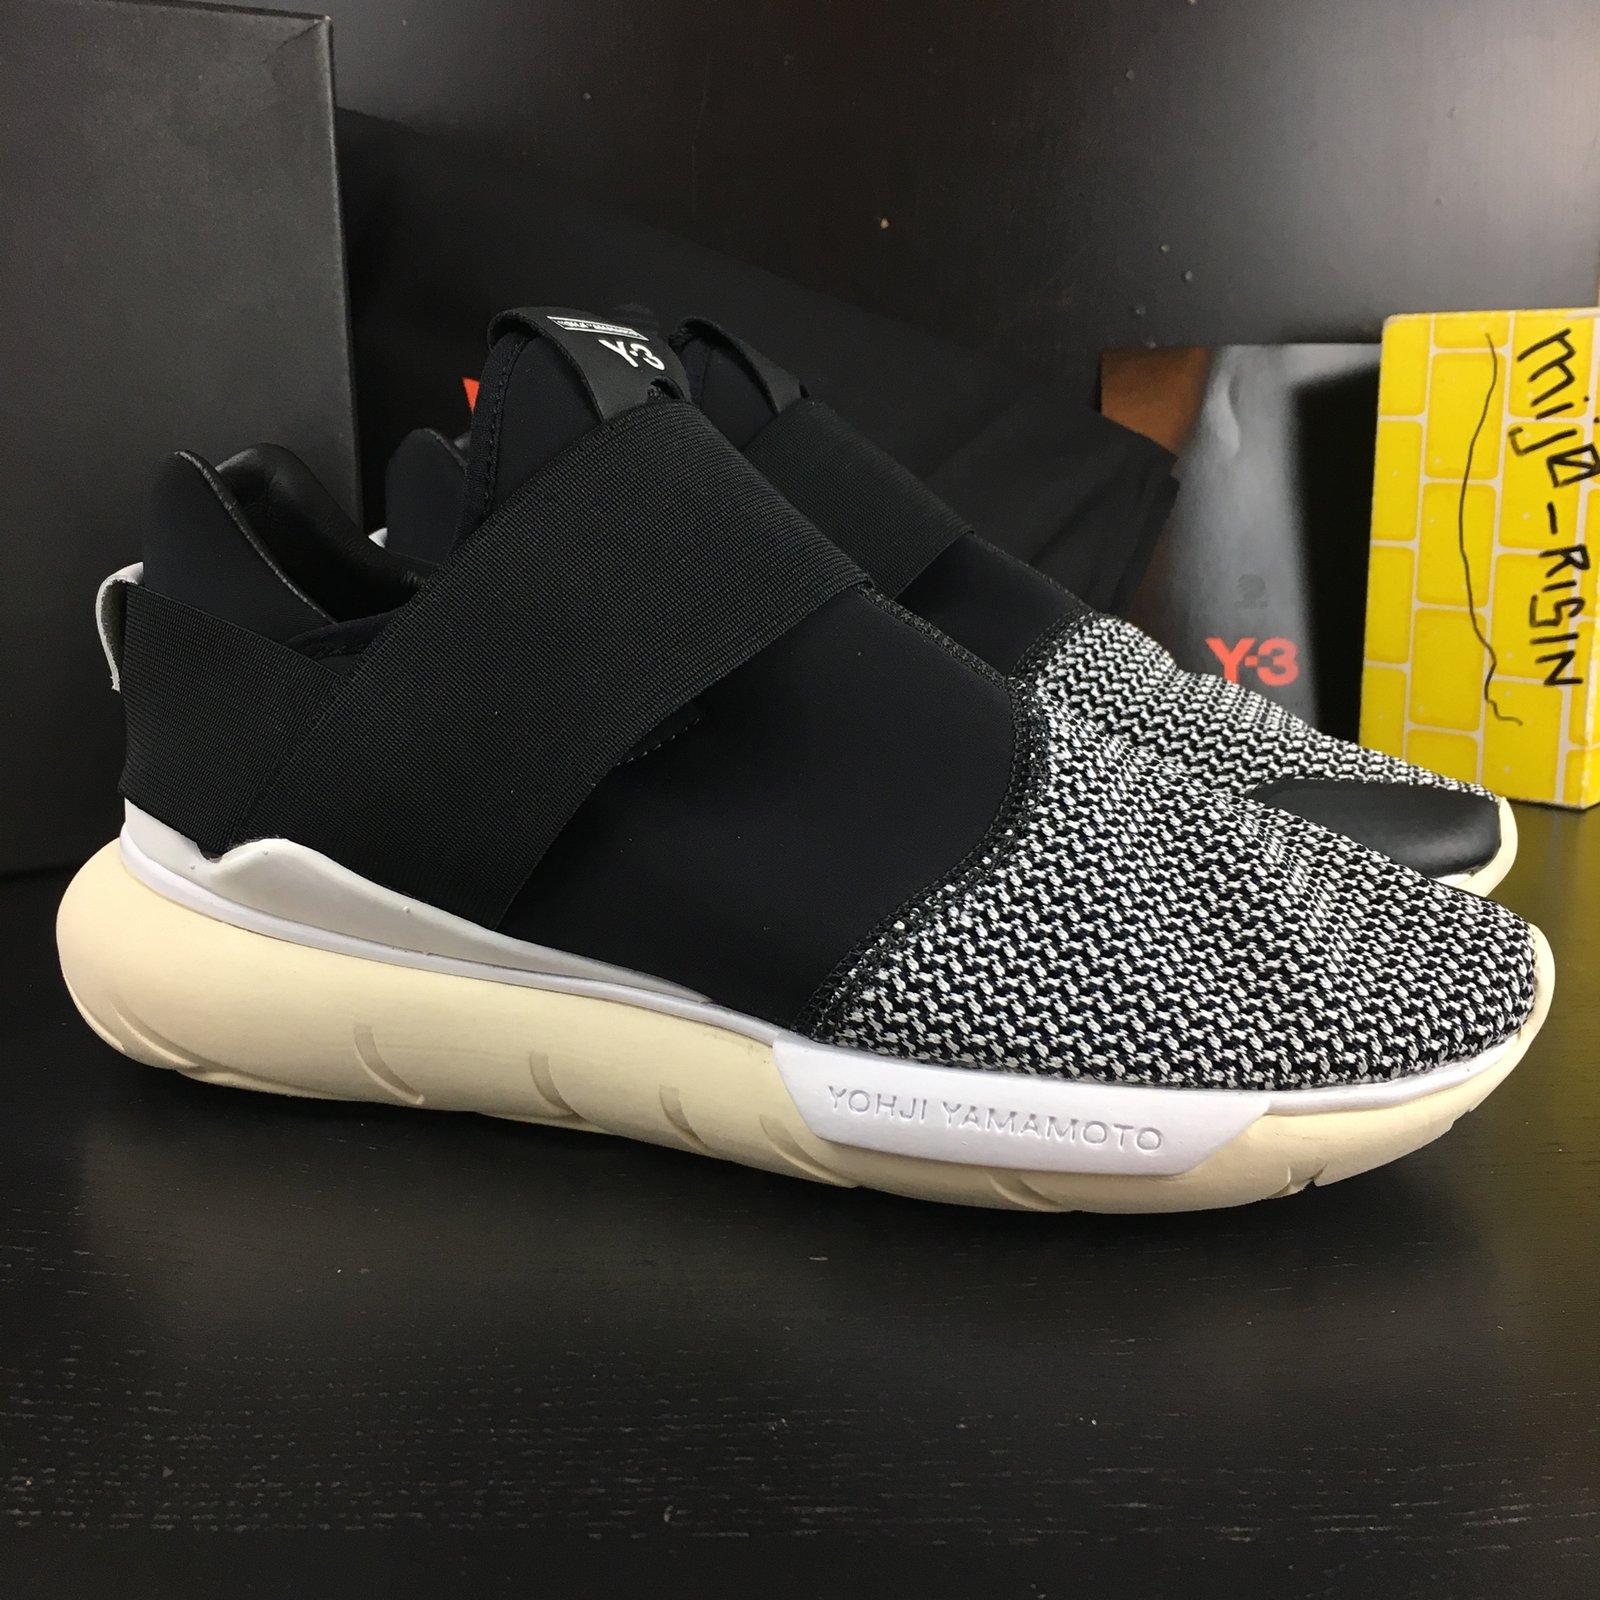 PADS Adidas Y-3 Qasa Low II Men size 8